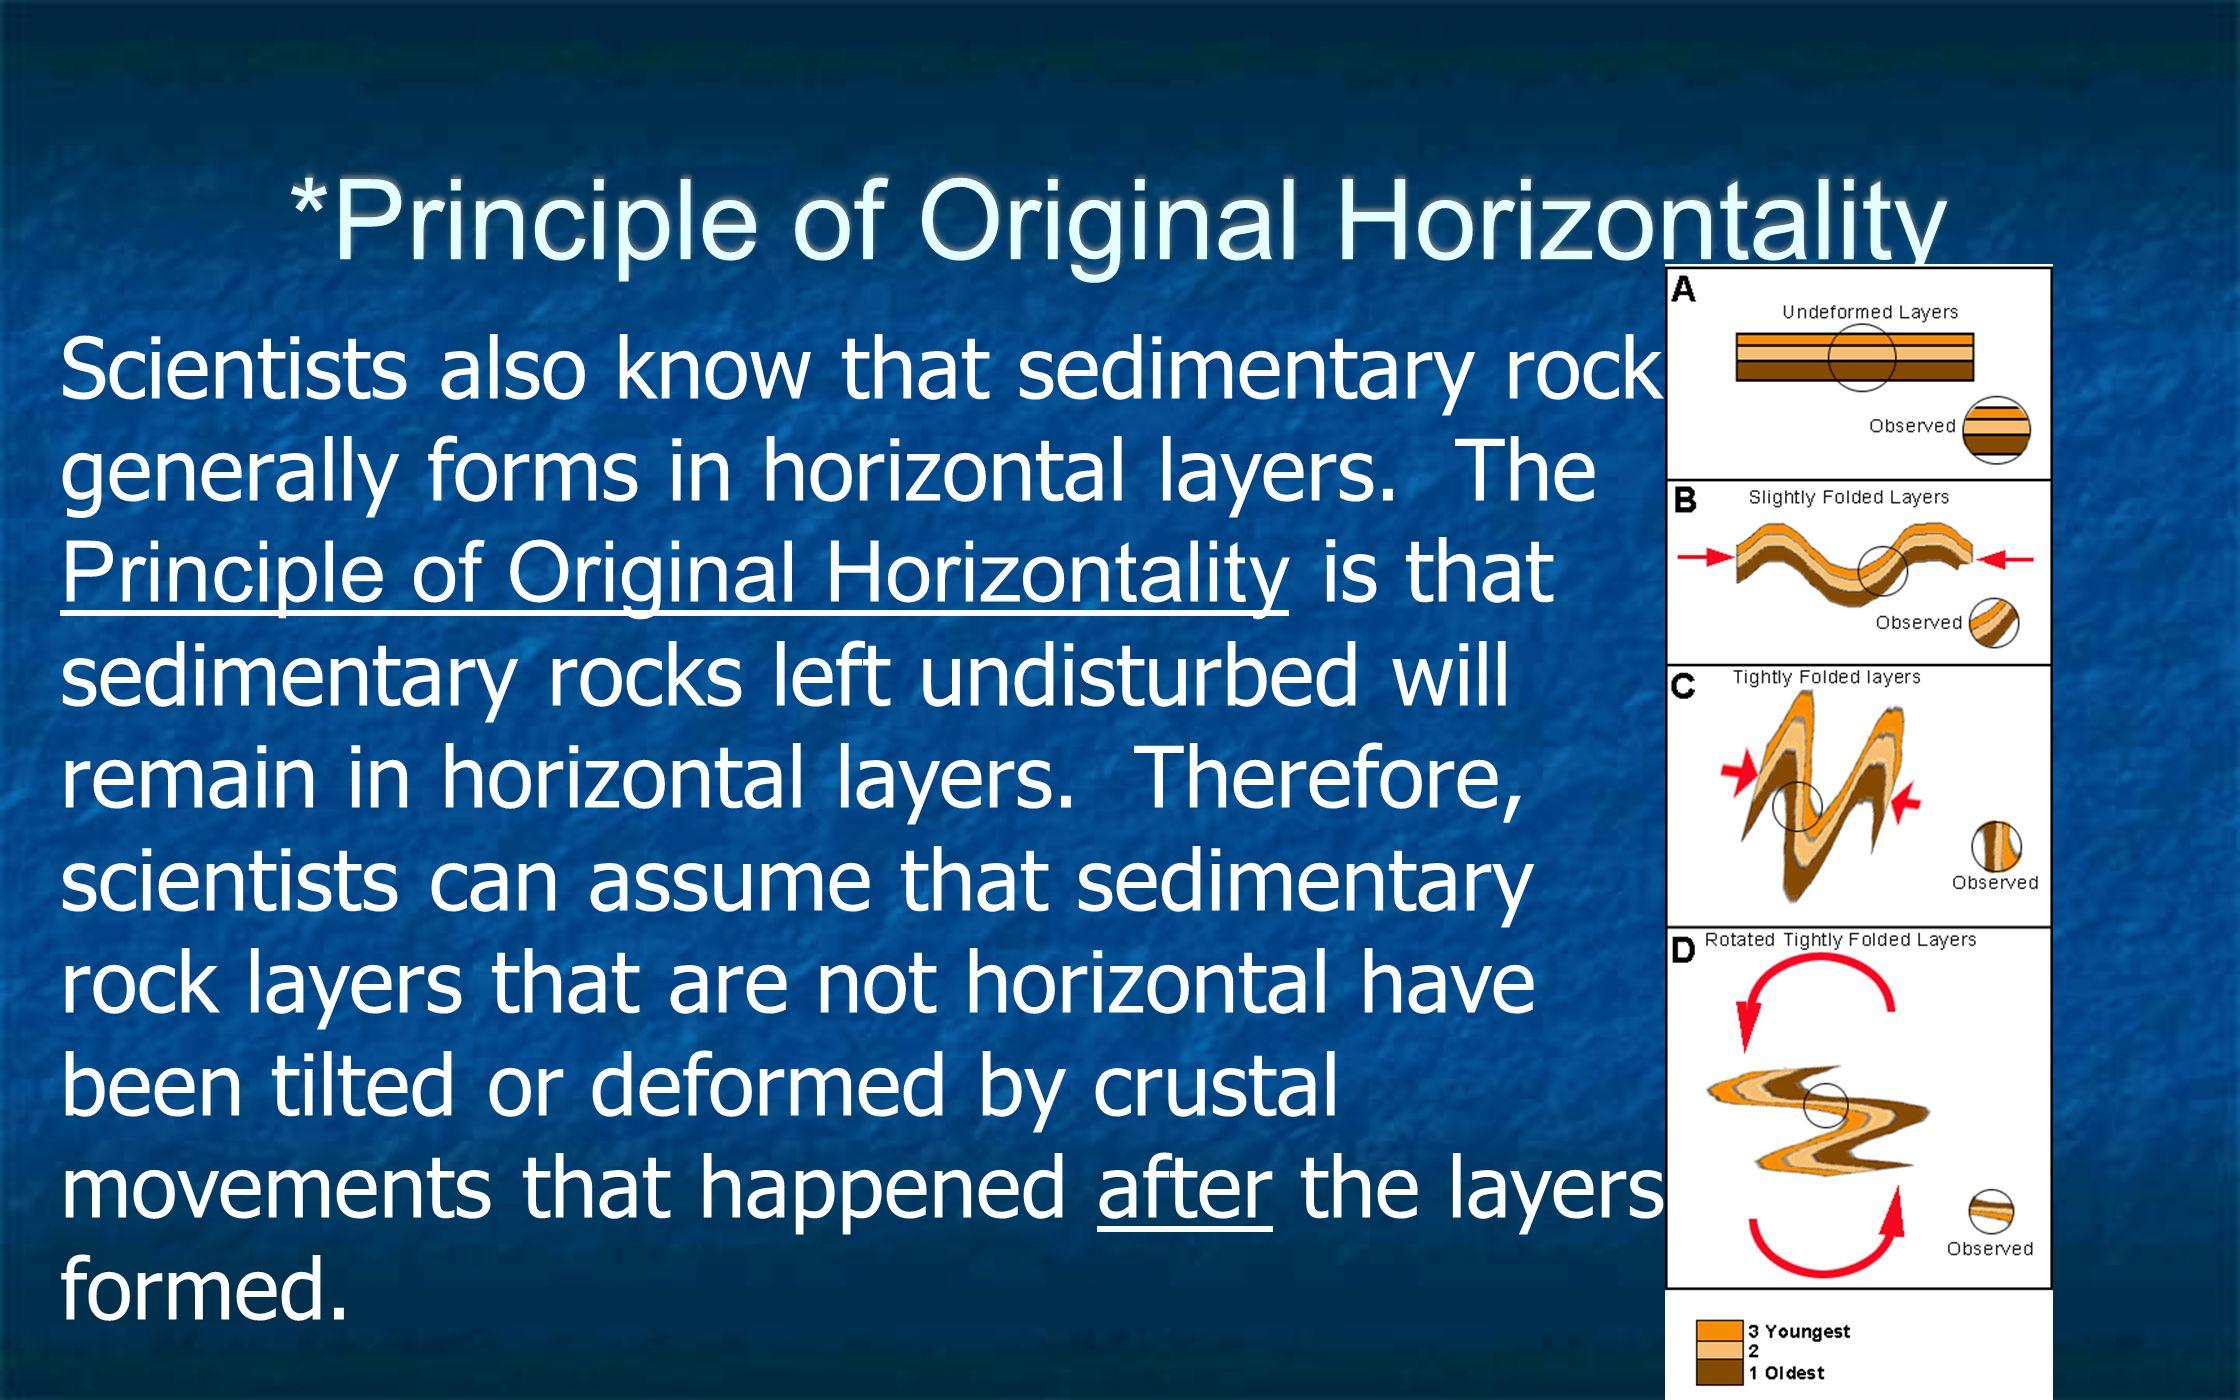 *Principle of Original Horizontality